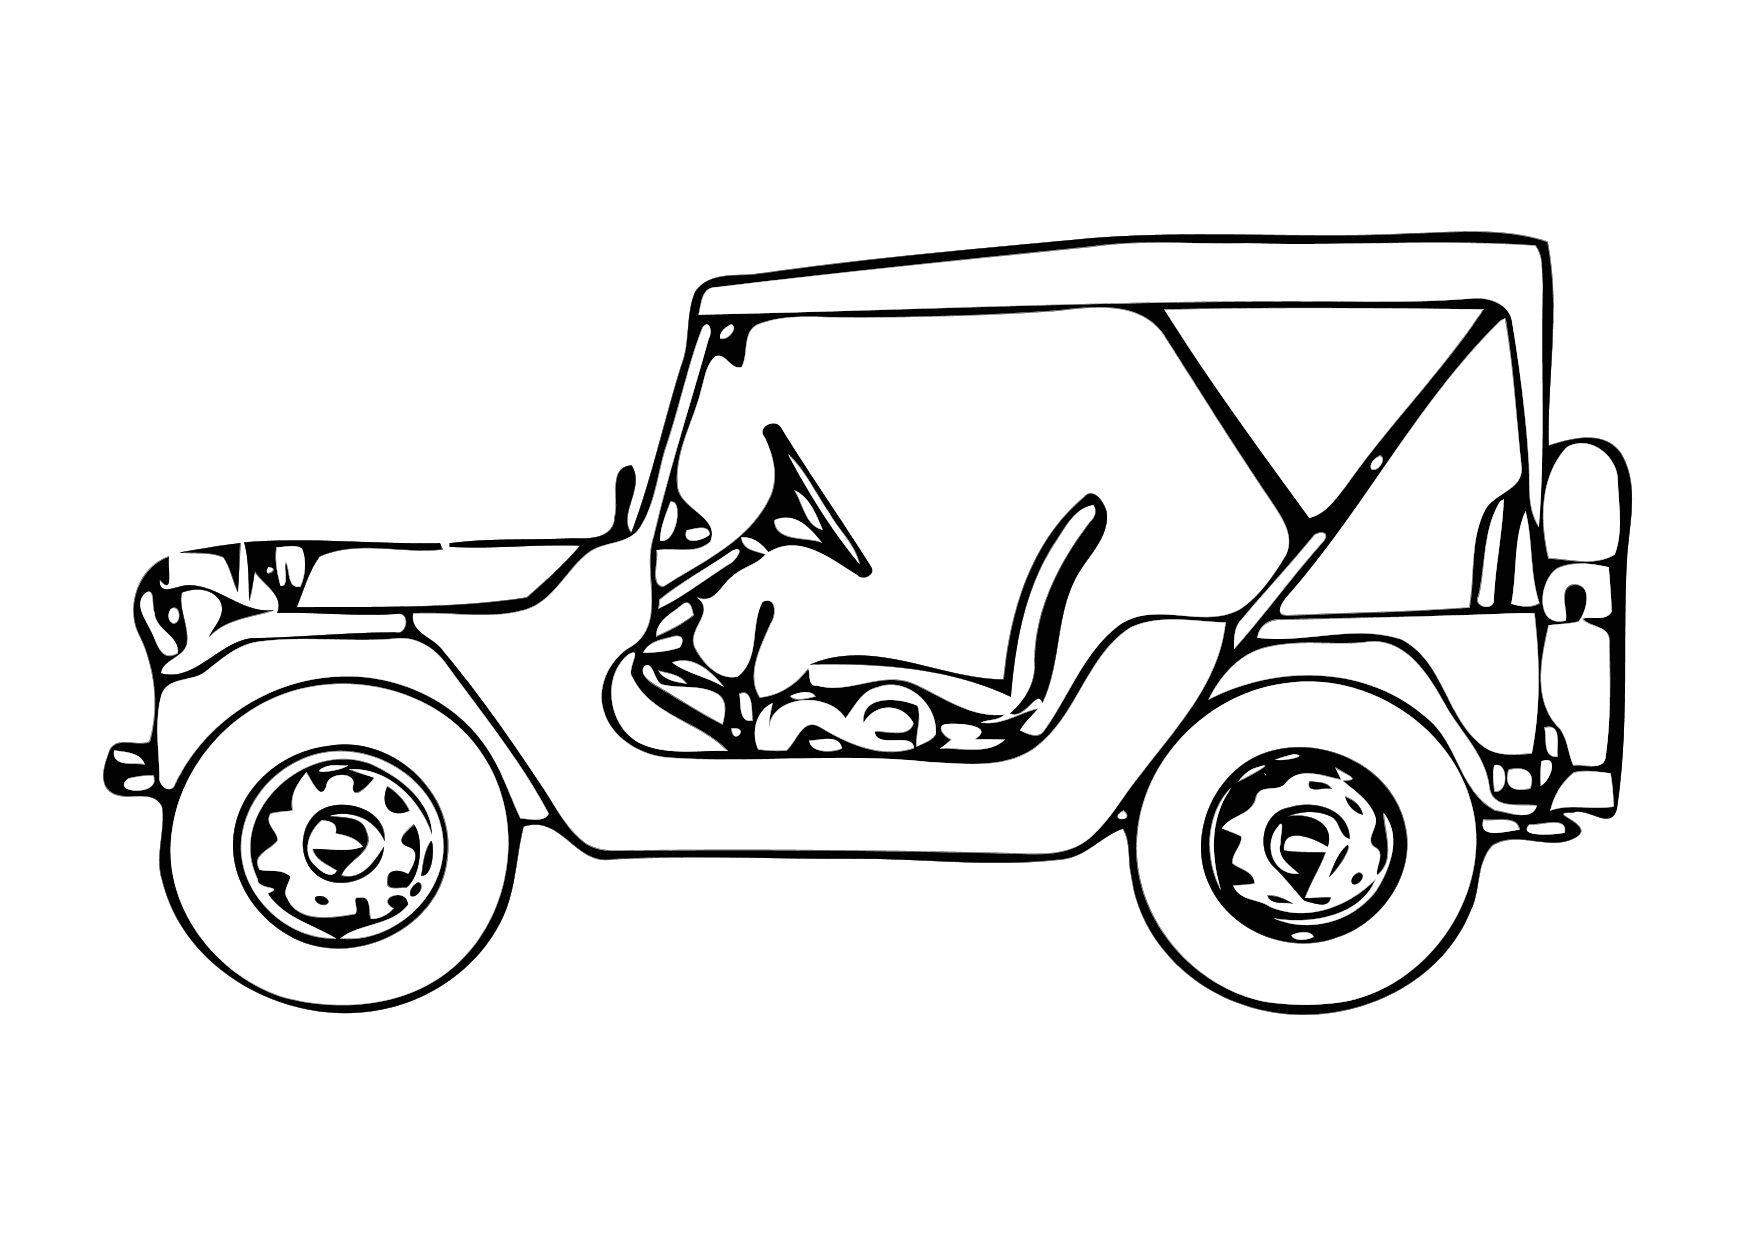 Kleurplaten Legerjeep.Kleurplaat Legerjeep Coloriage Jeep Img 11327 Kleurplatenl Com